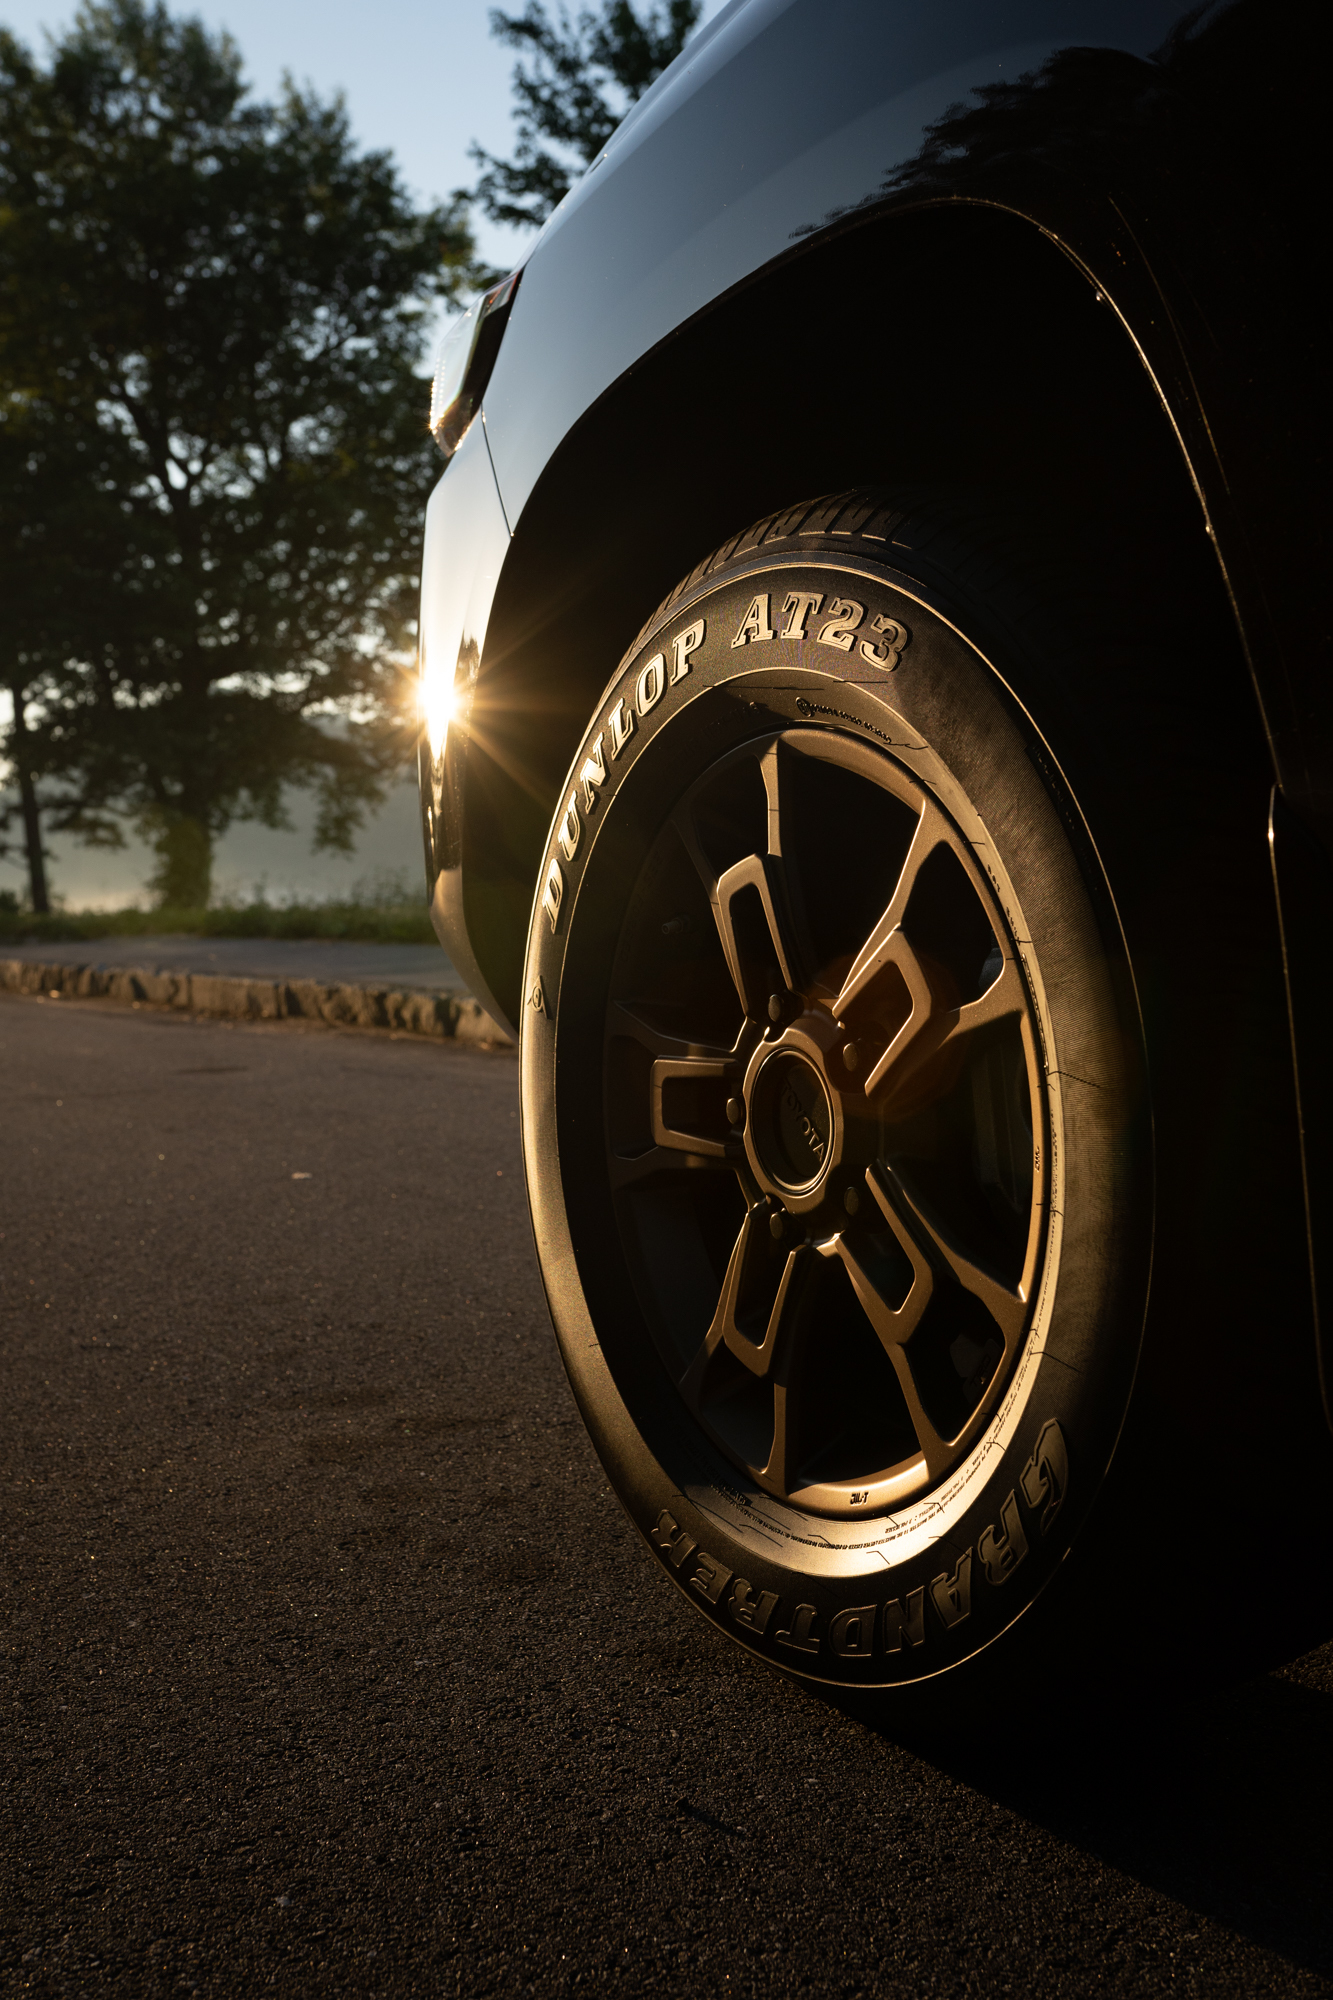 Toyota Land Cruiser Wheel and Tire